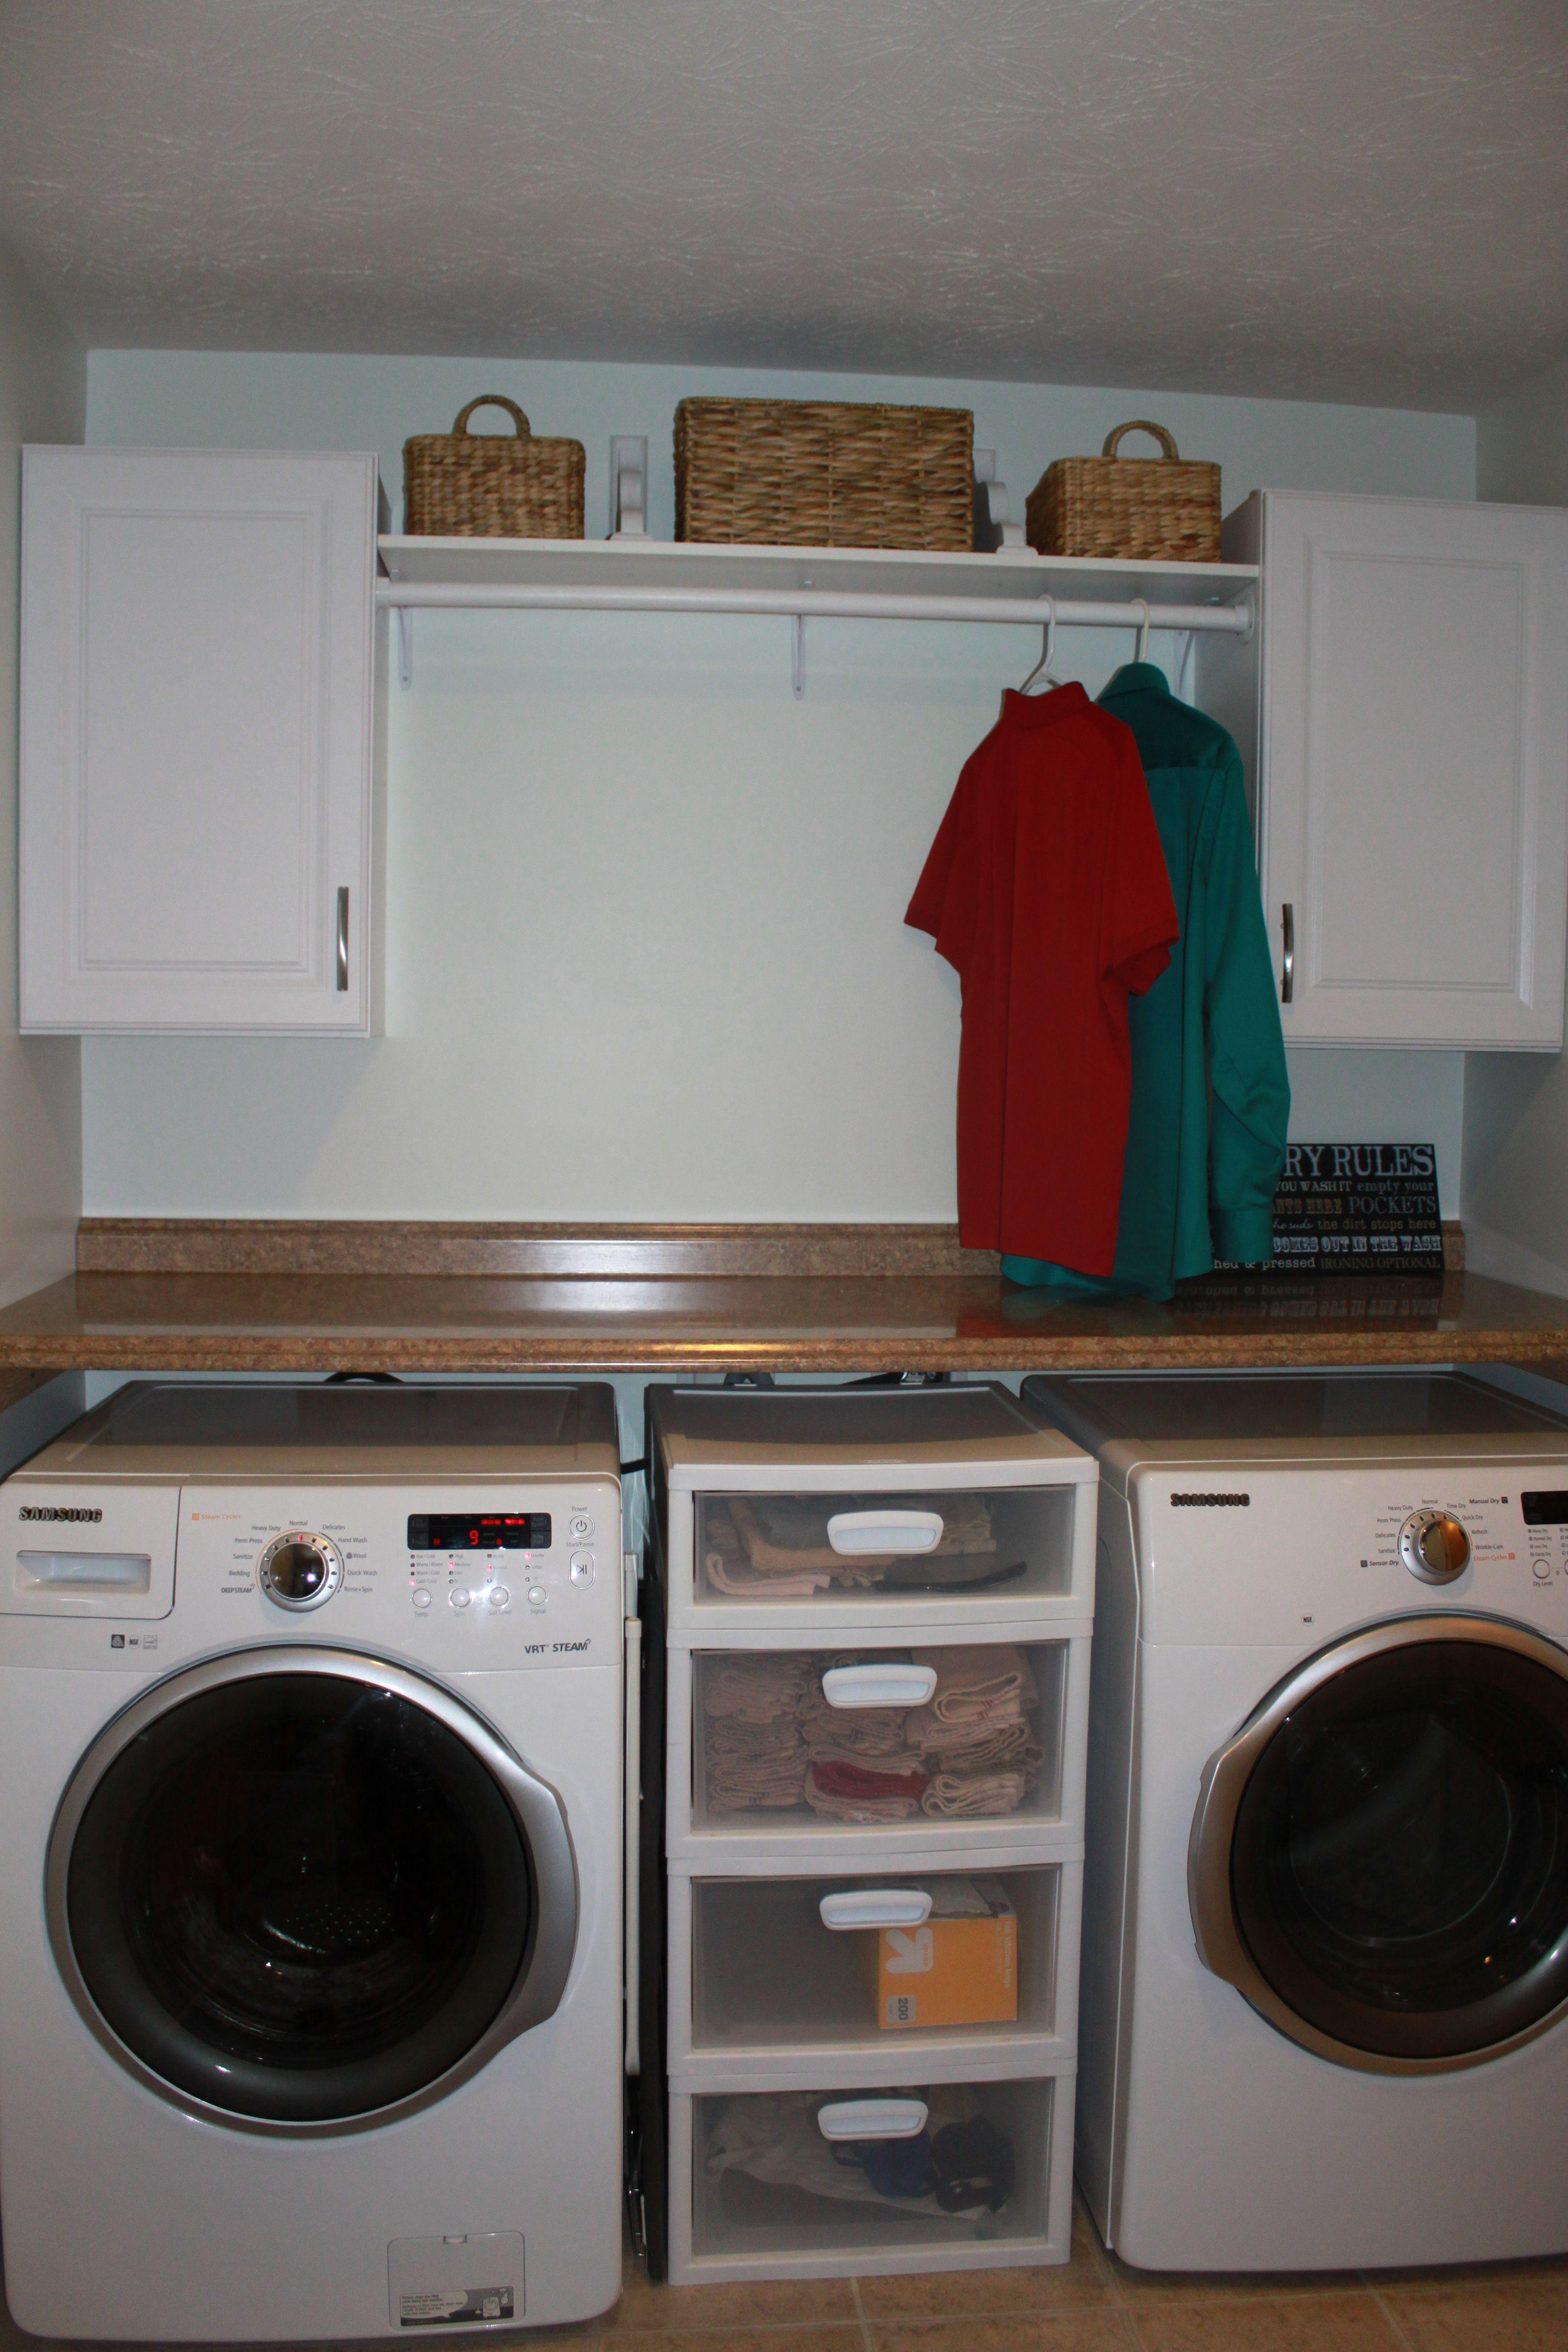 My Very Own Diy Laundry Room Makeover So Easy Lavanderia